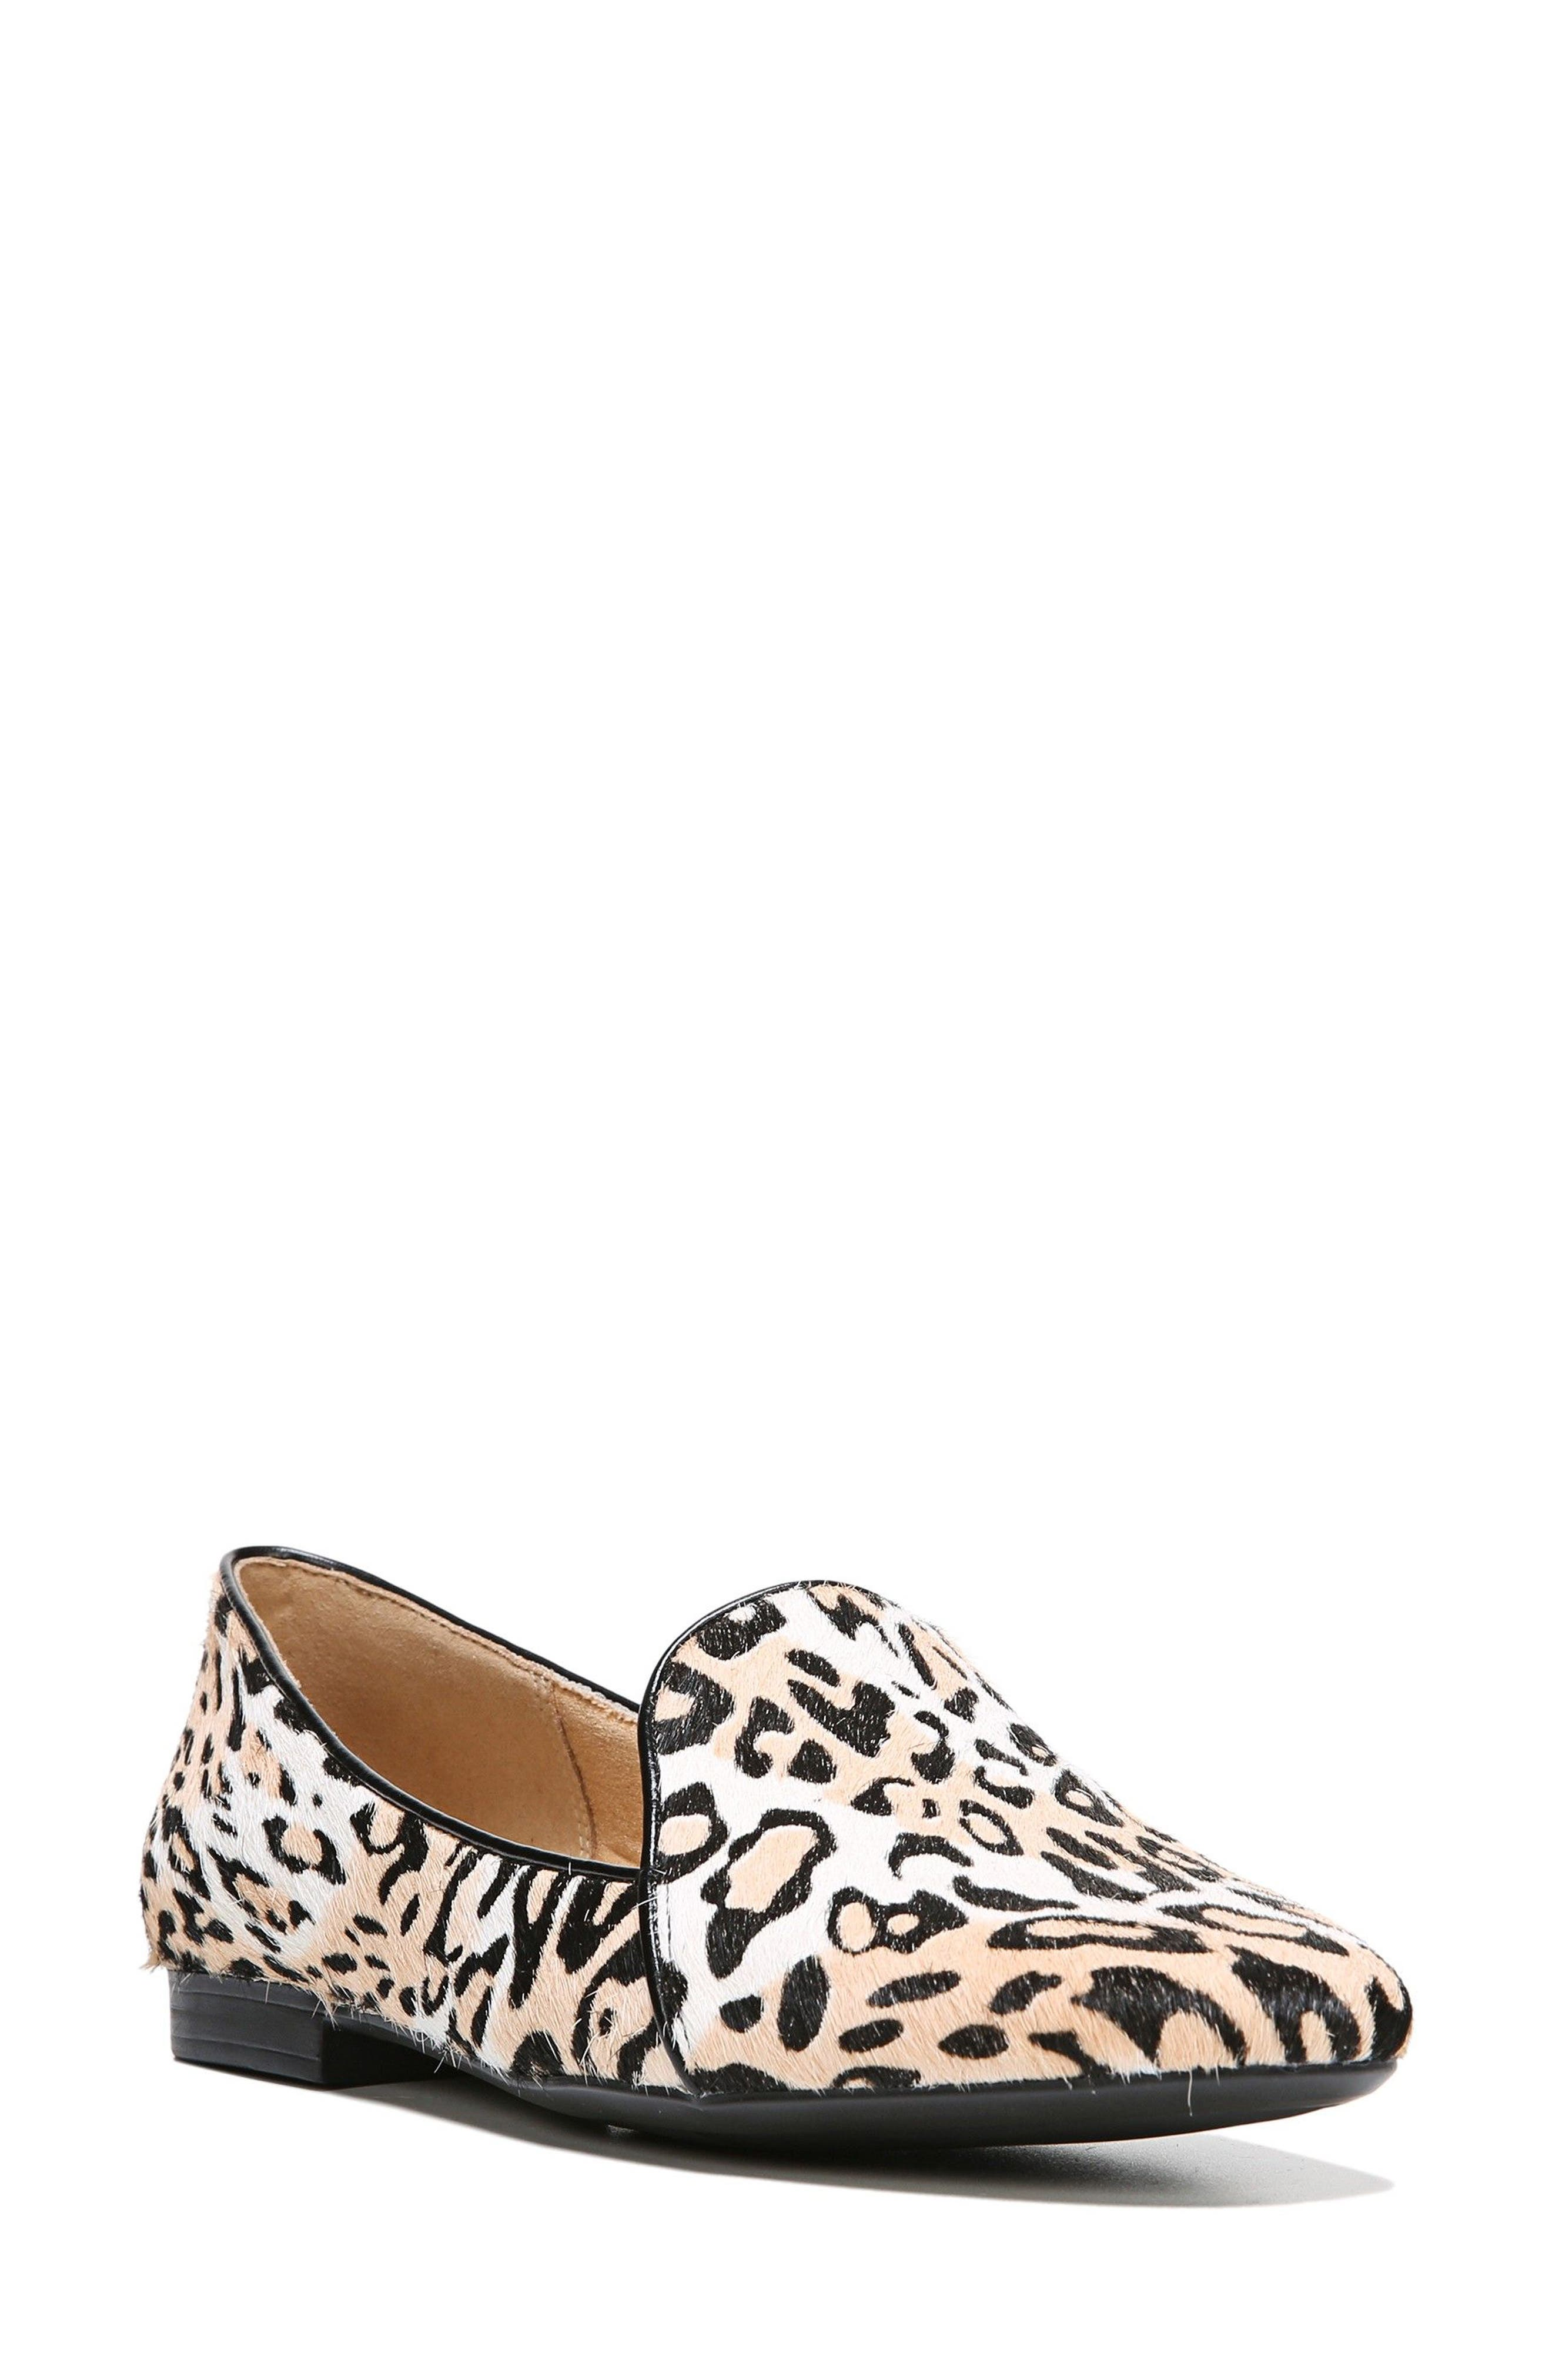 Emiline 2 Loafer,                         Main,                         color, Cheetah Brahma Hair